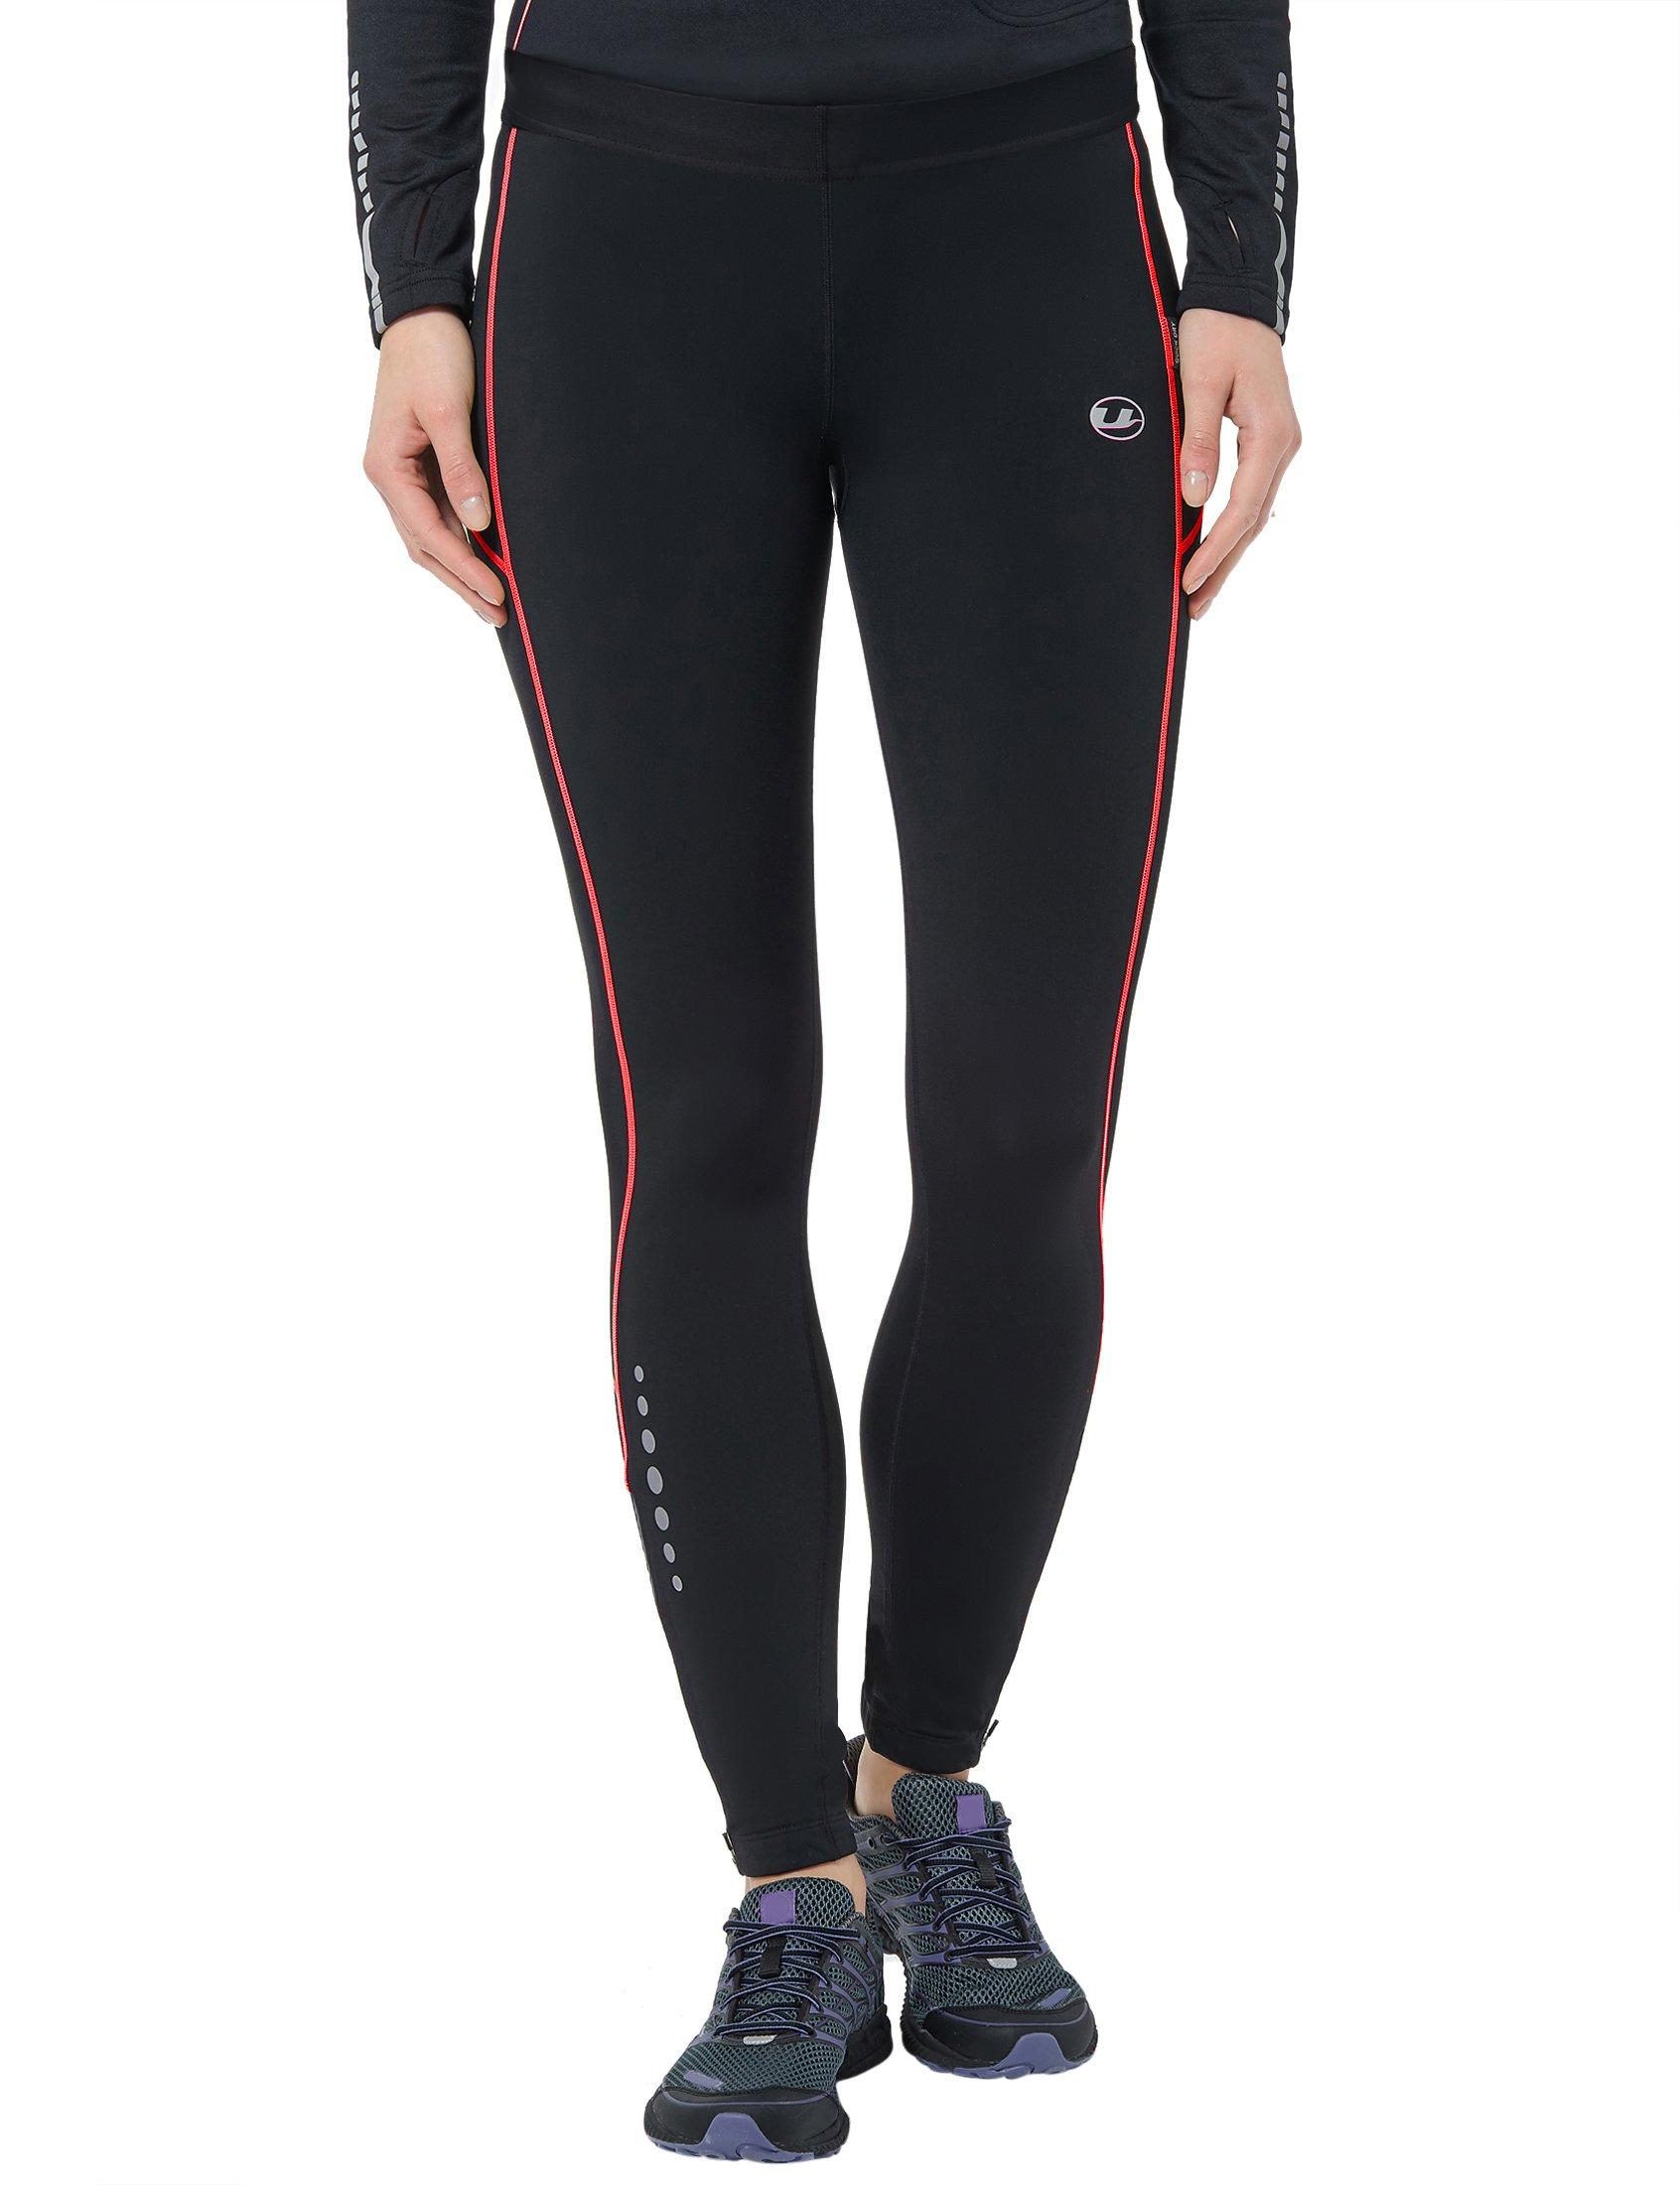 Ultrasport Damen Laufhose lang, black dubarry, S, 10127